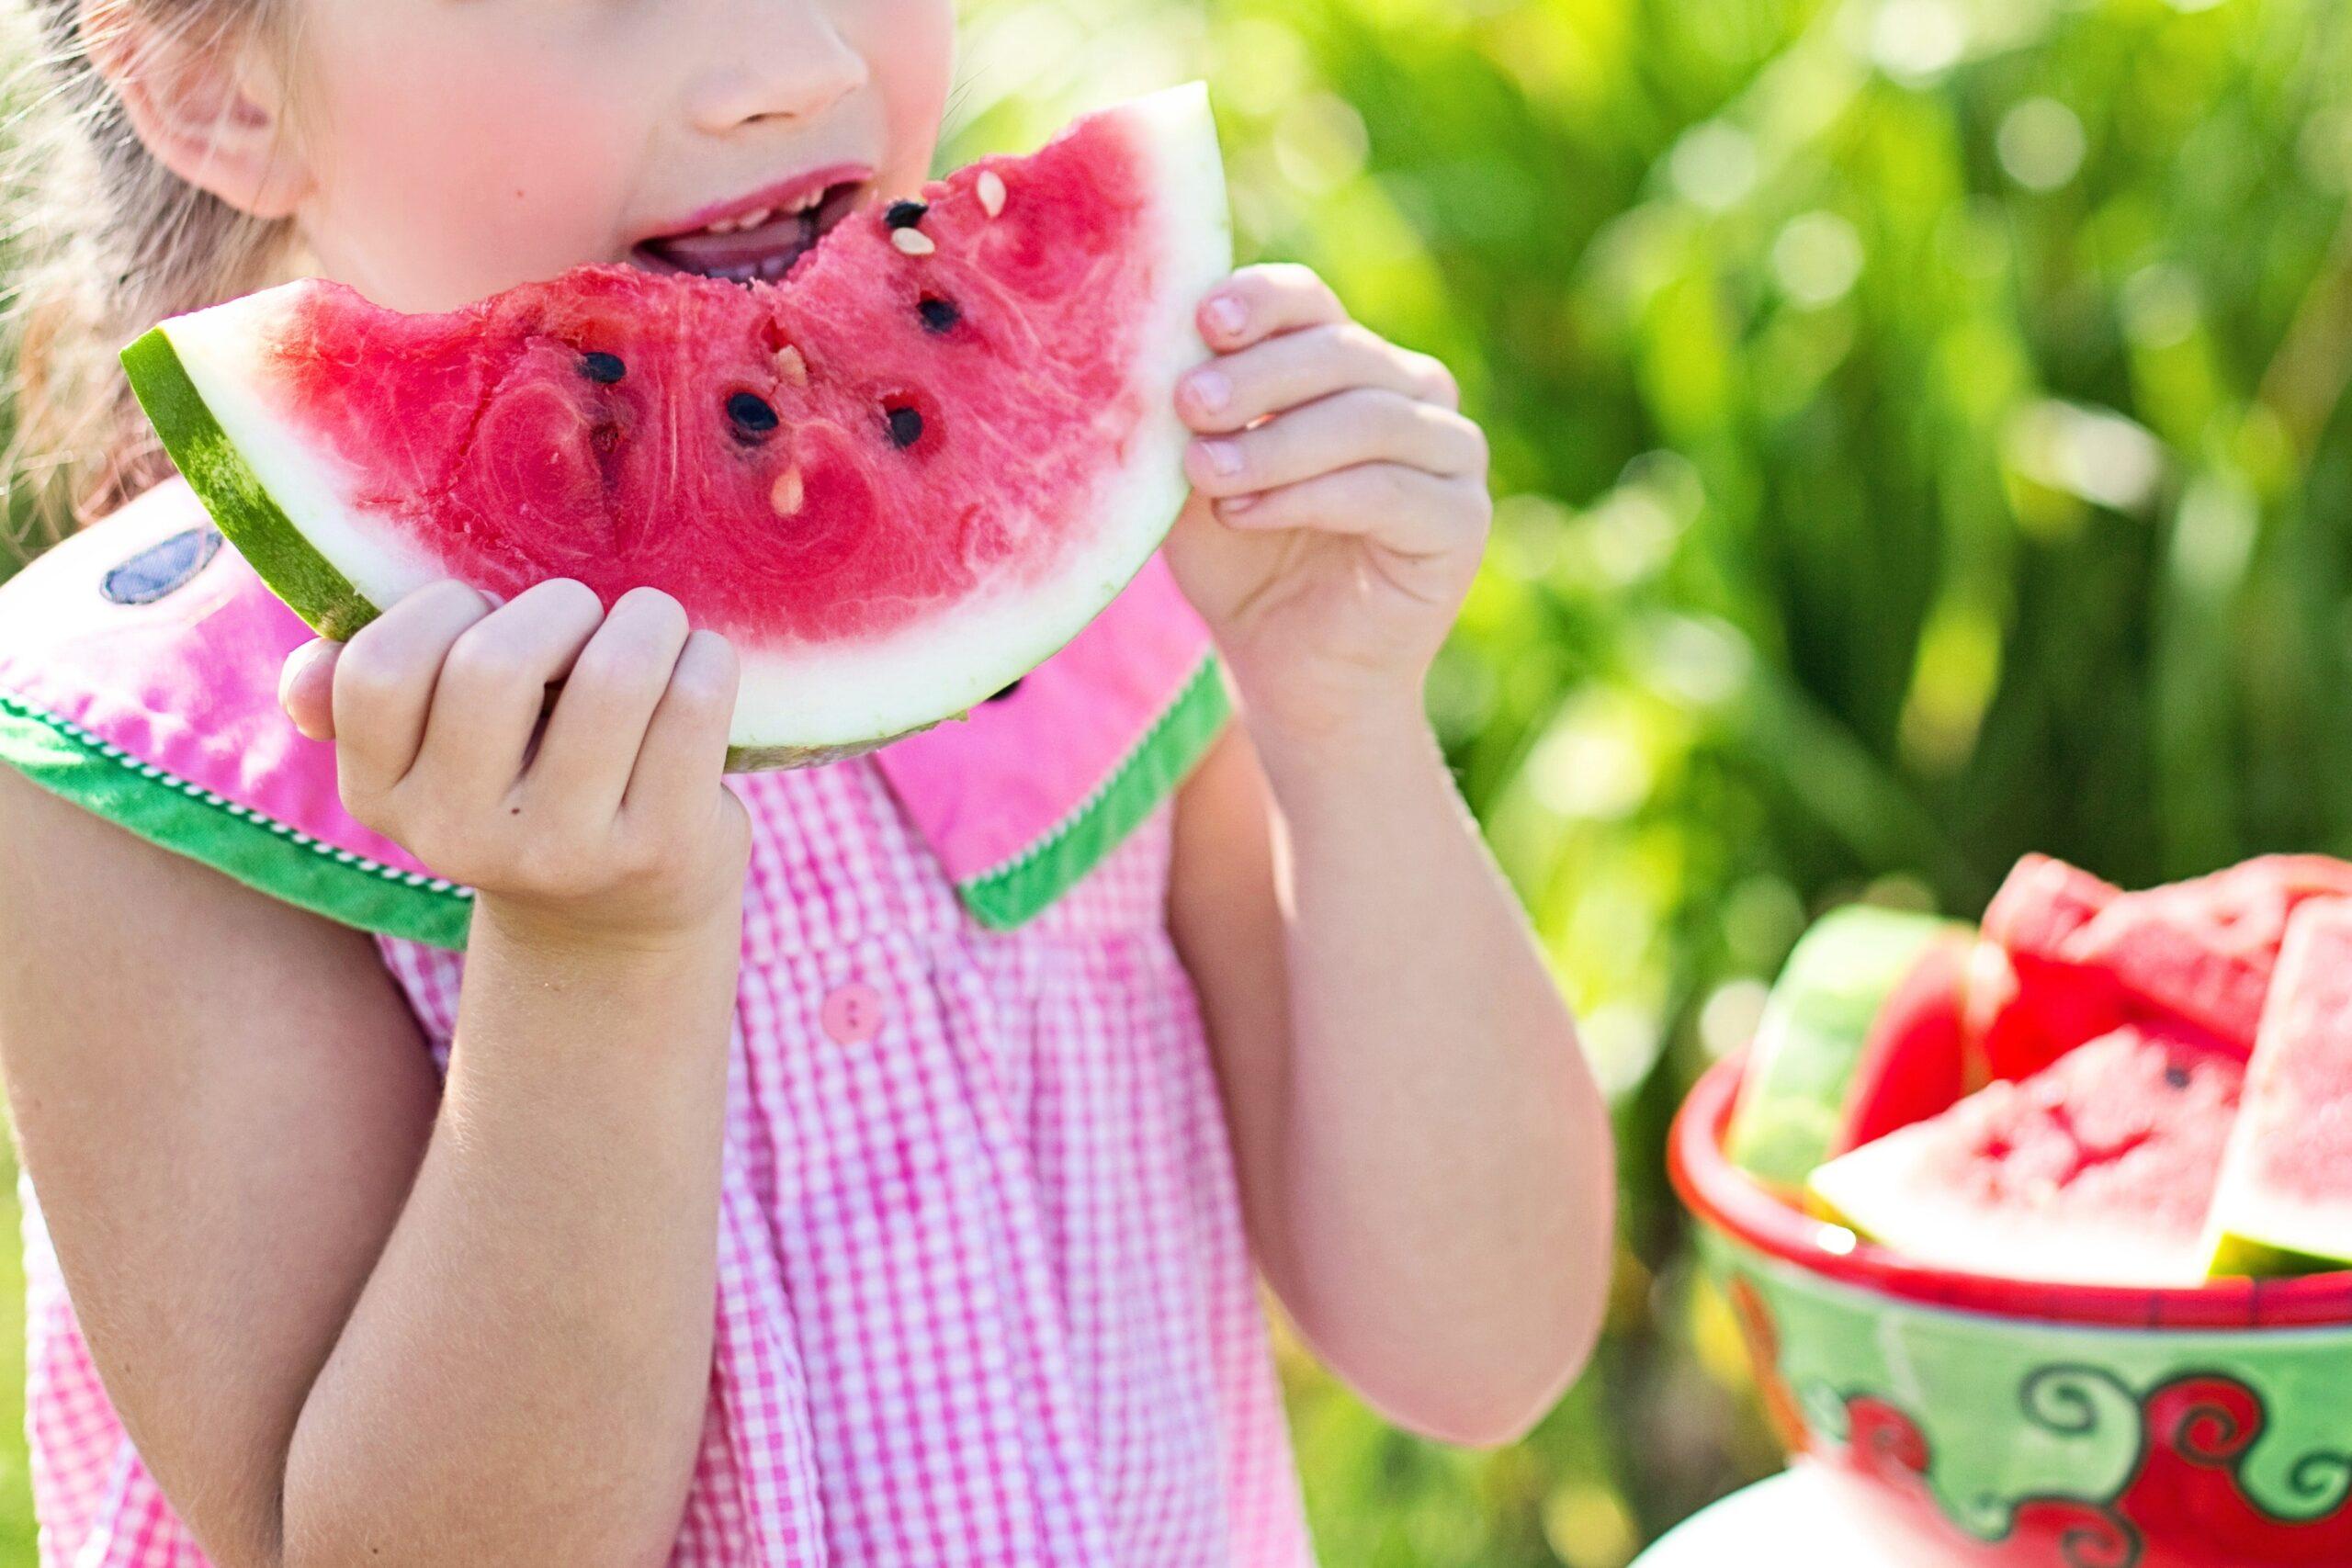 Little girl eating a watermelon outside